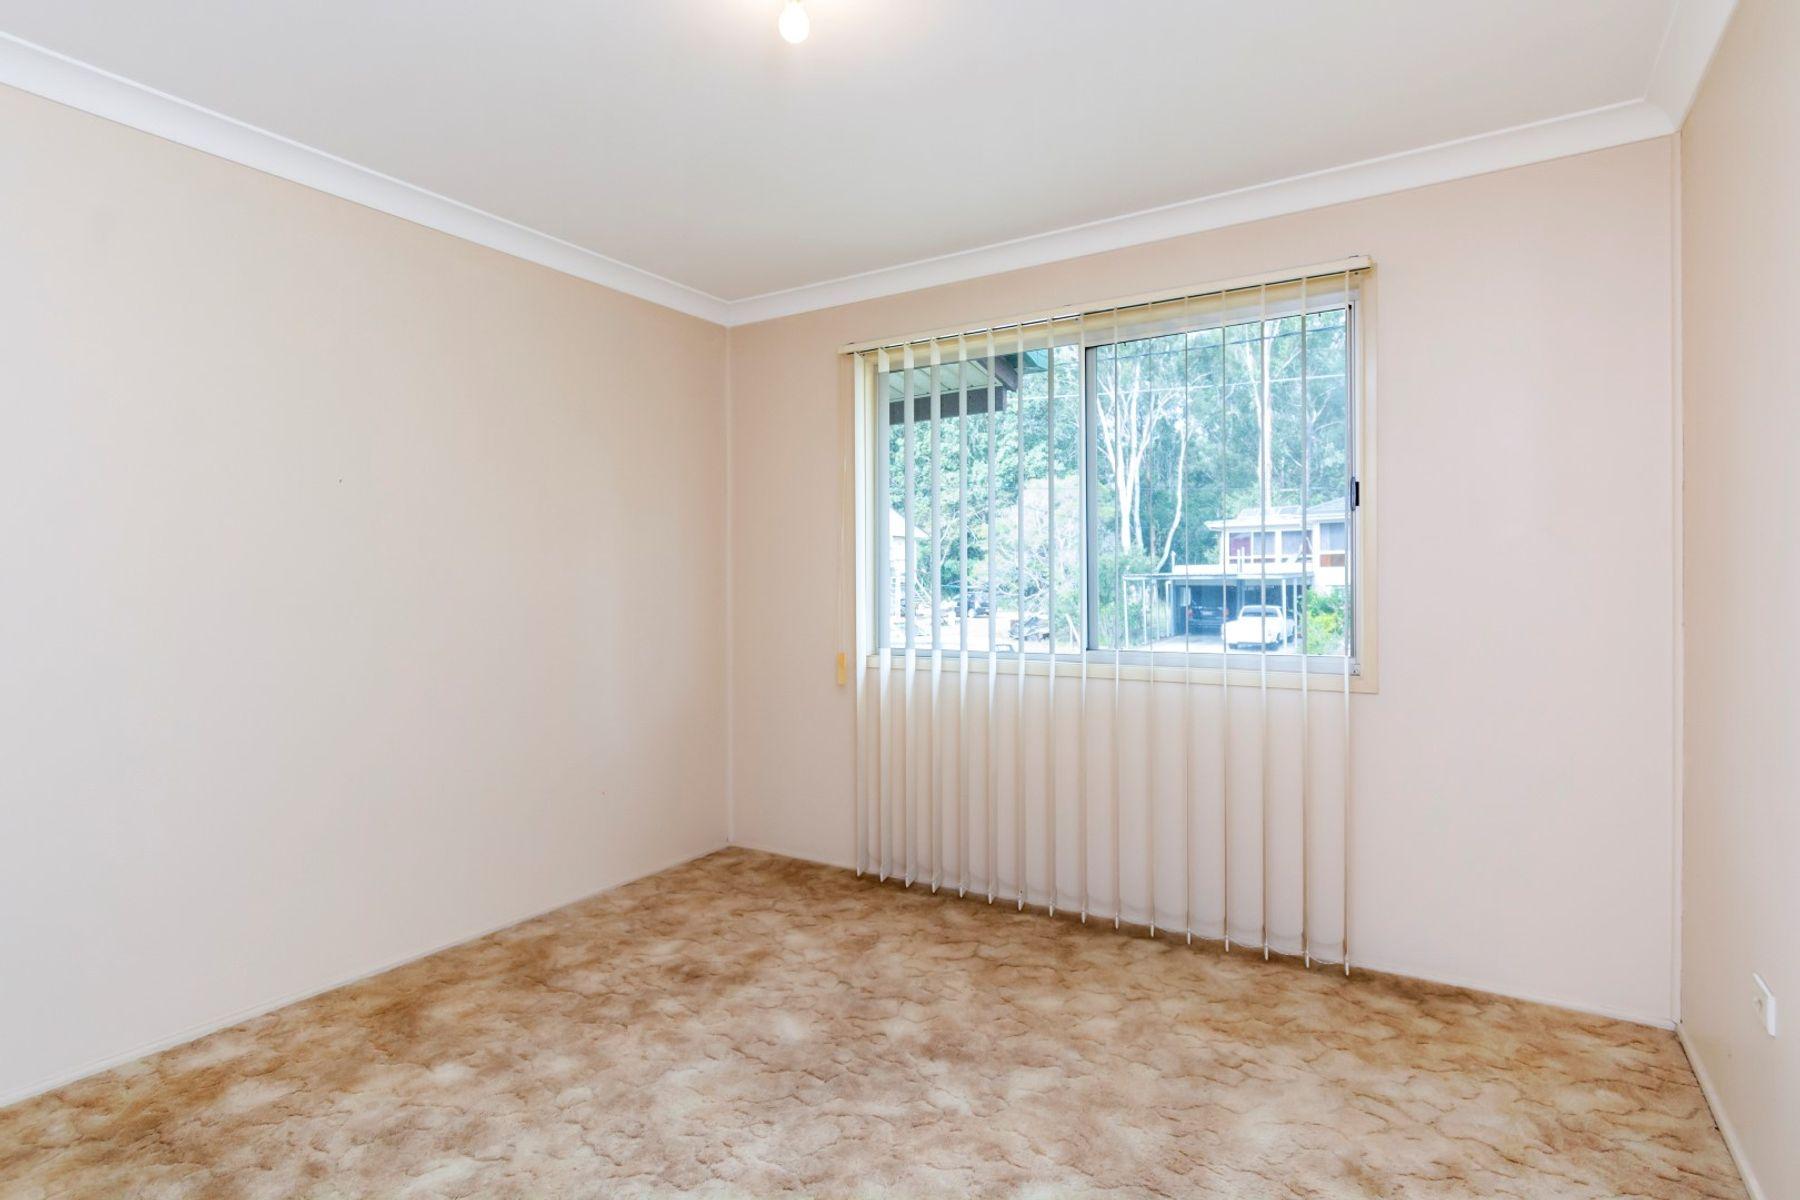 18 Tibbits Street, Bundamba, QLD 4304